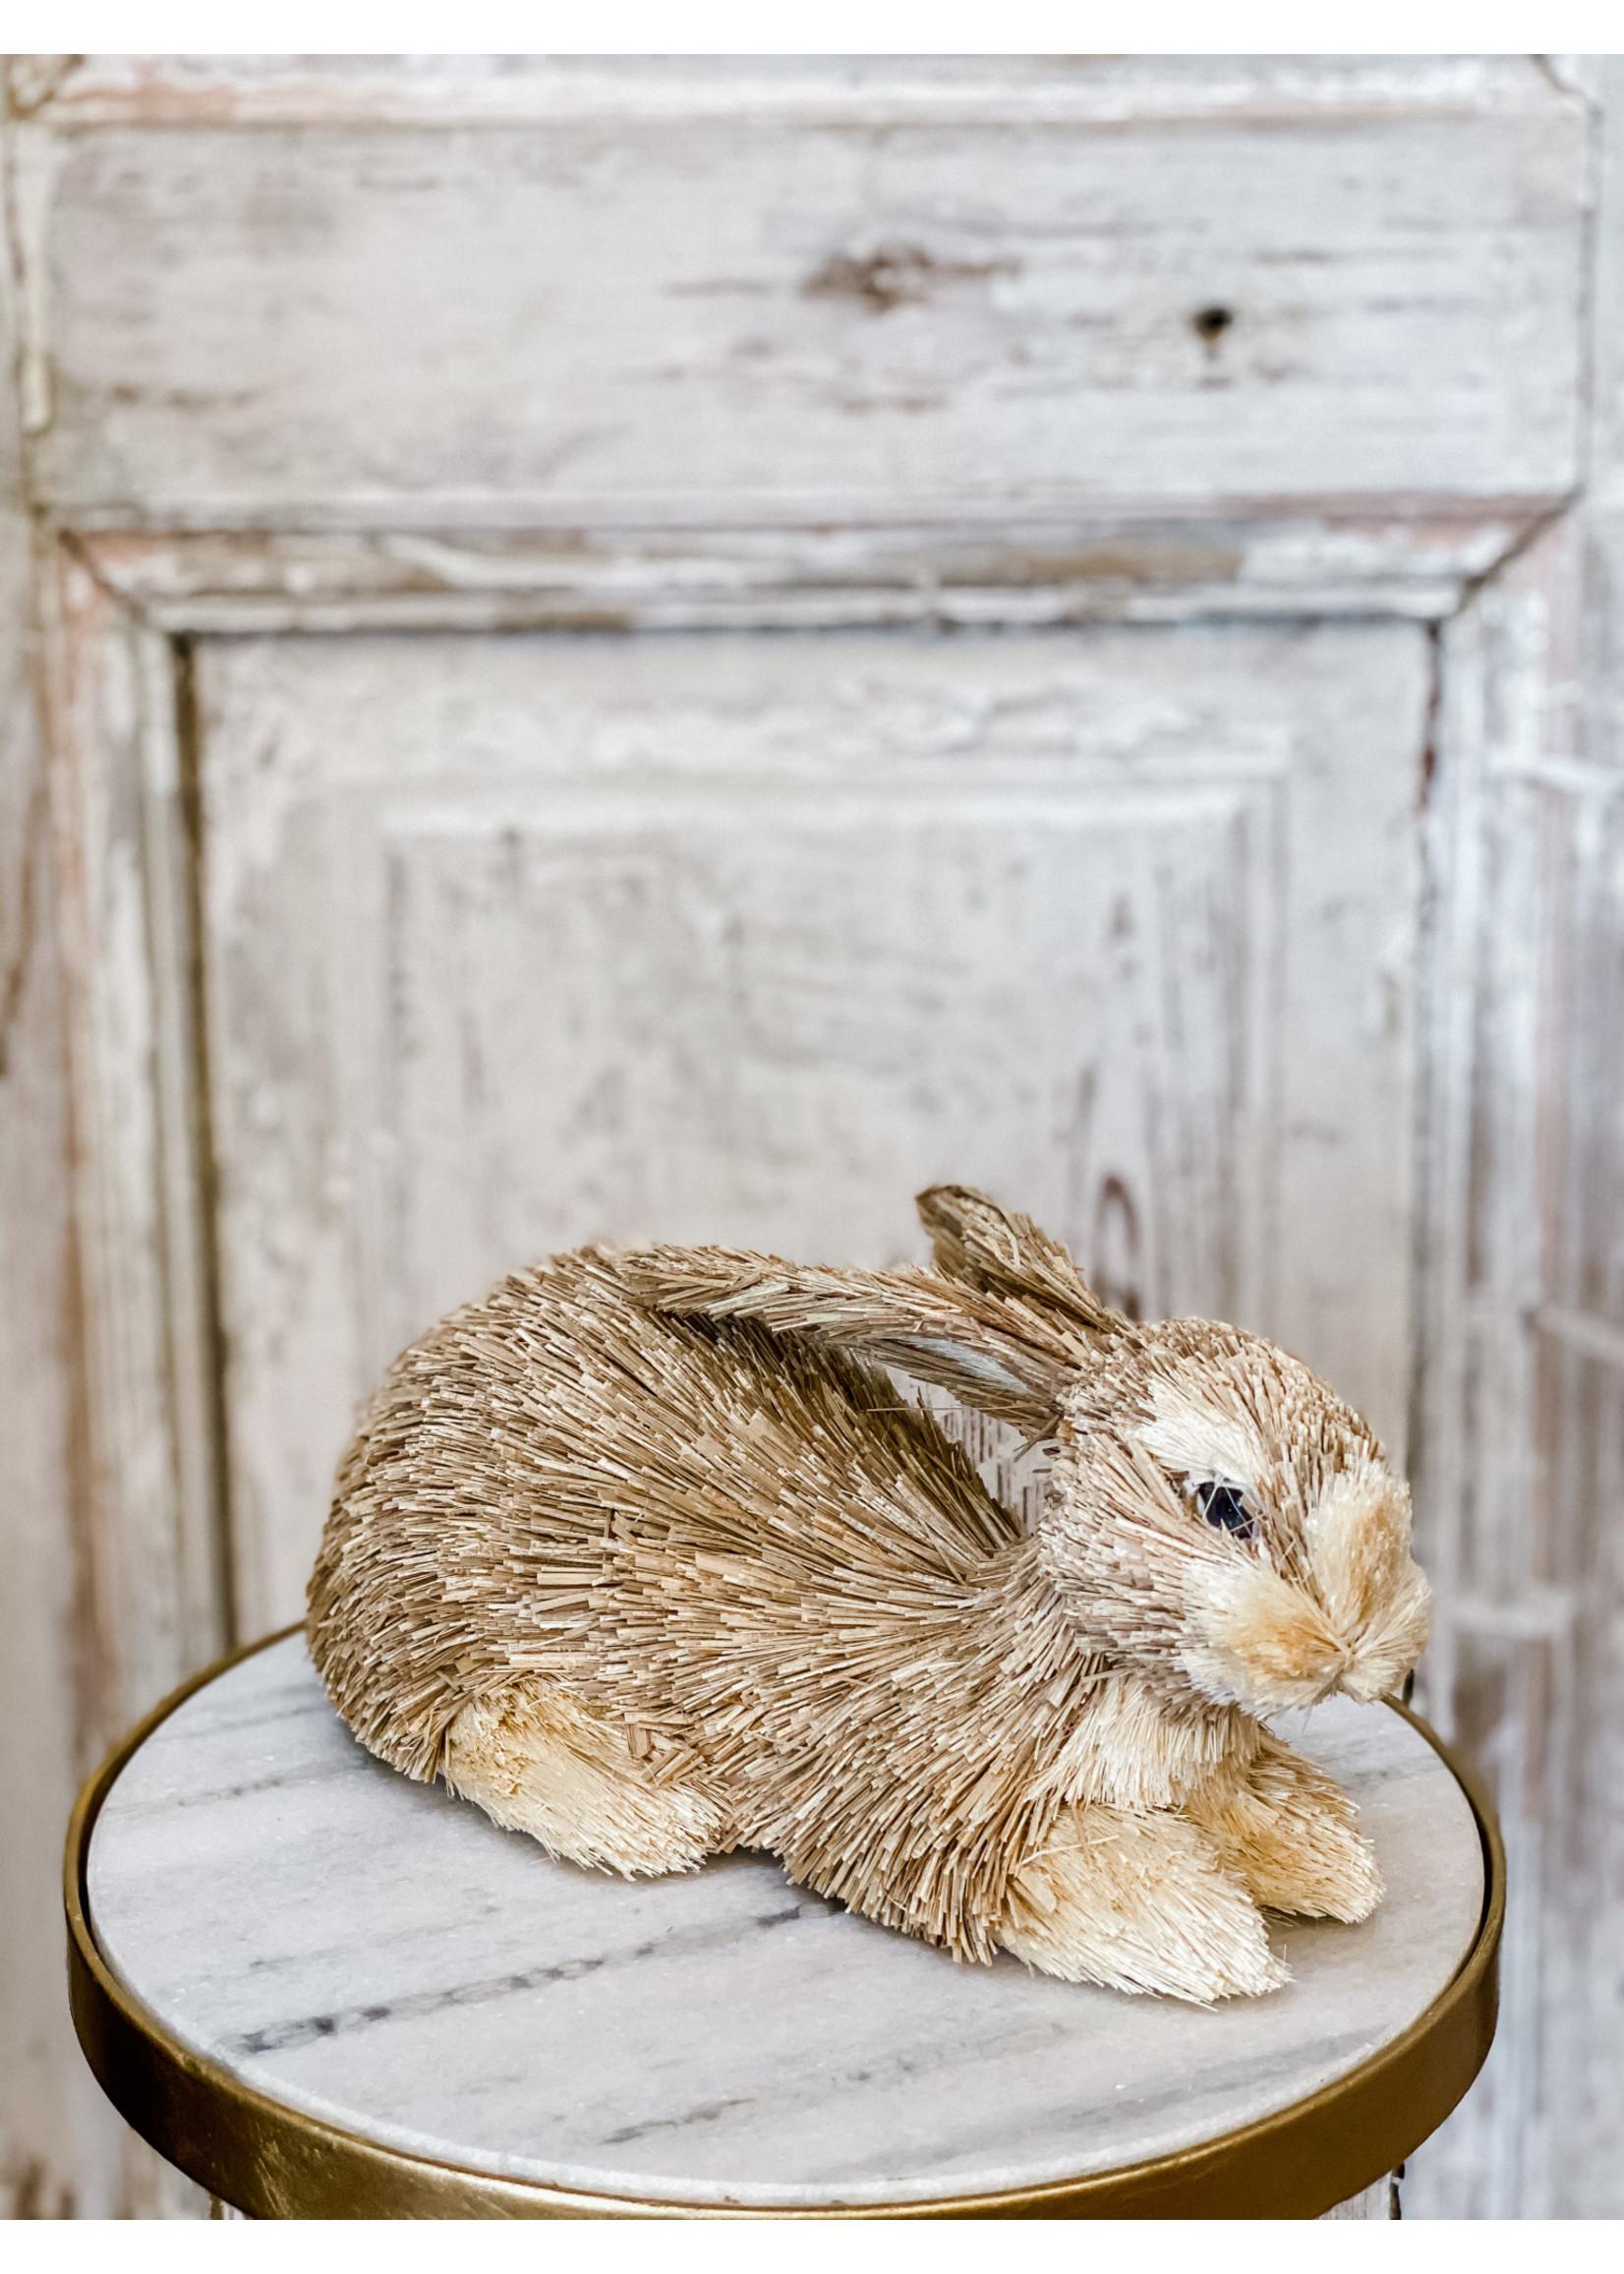 Rabbit Laying